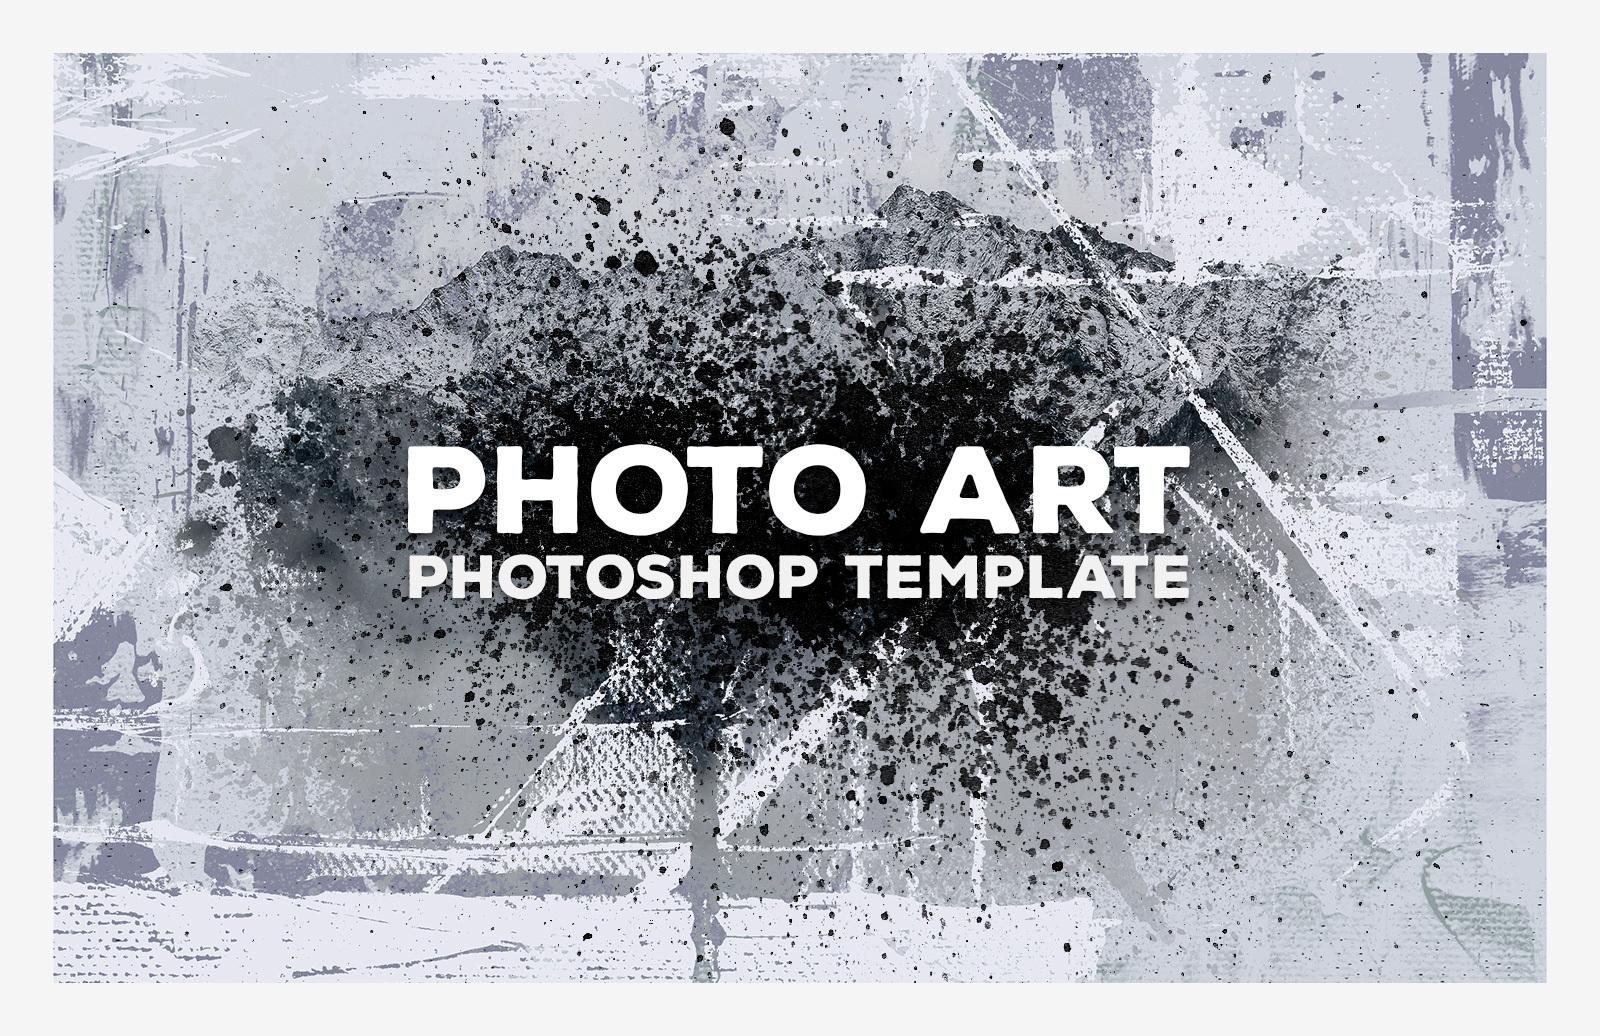 Photo Art Photoshop Template